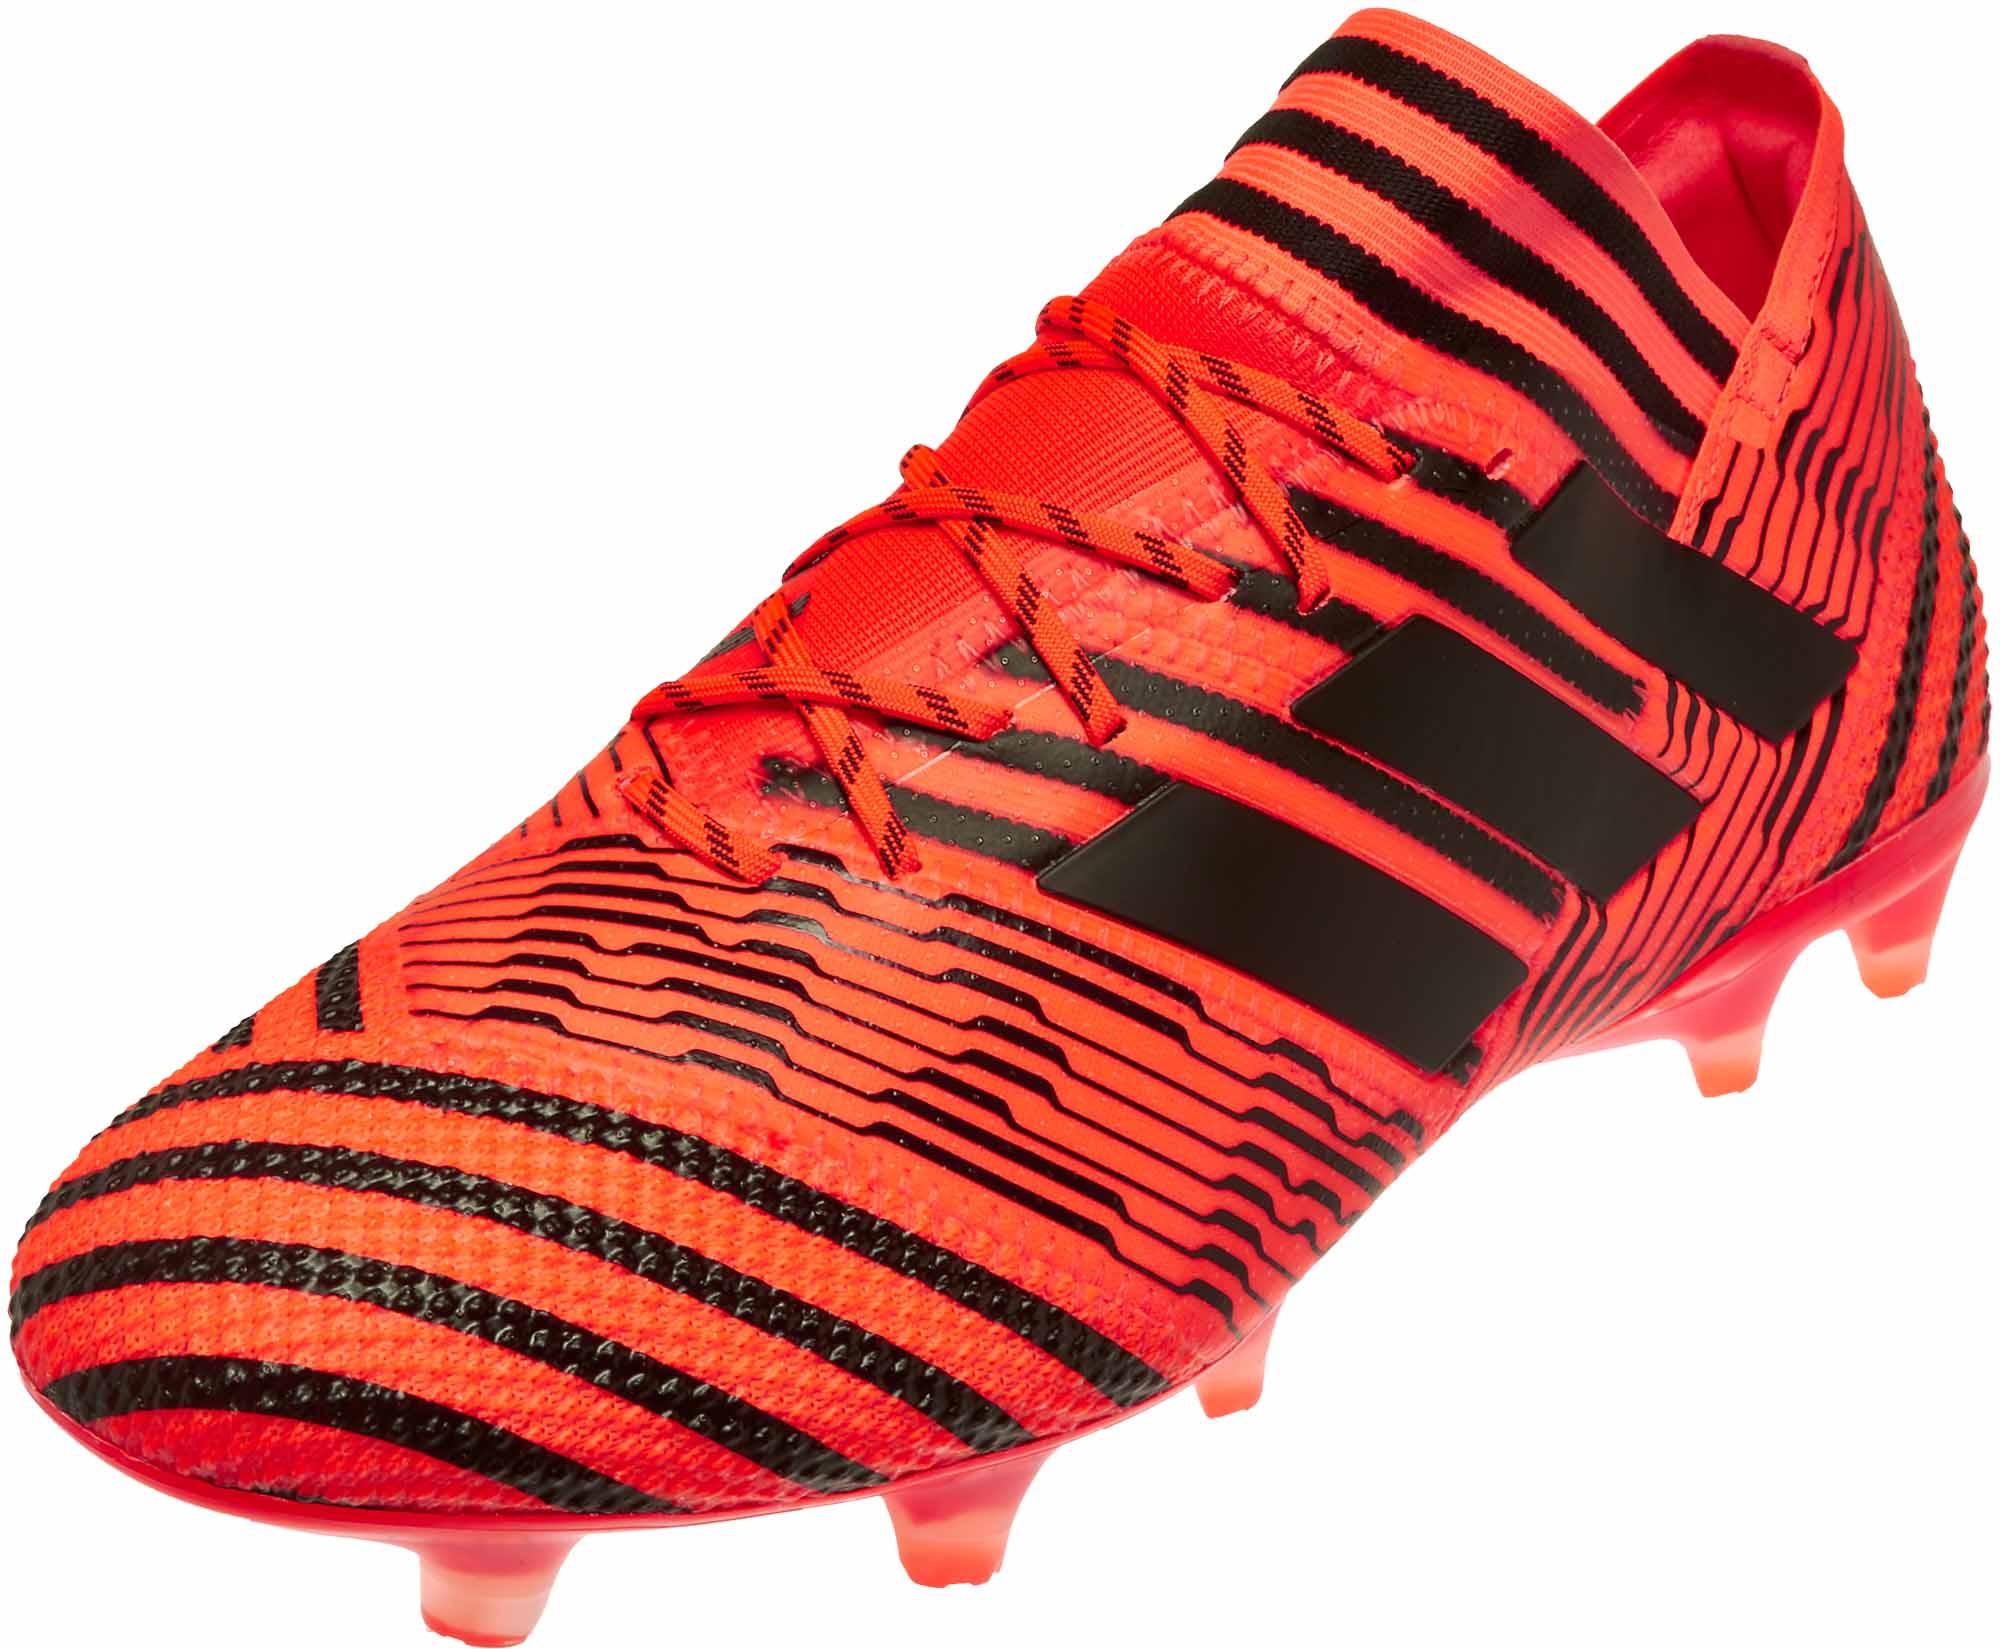 sale retailer ca9e0 1cfad adidas Nemeziz 17.1 FG Soccer Cleats – Solar Orange   Core Black